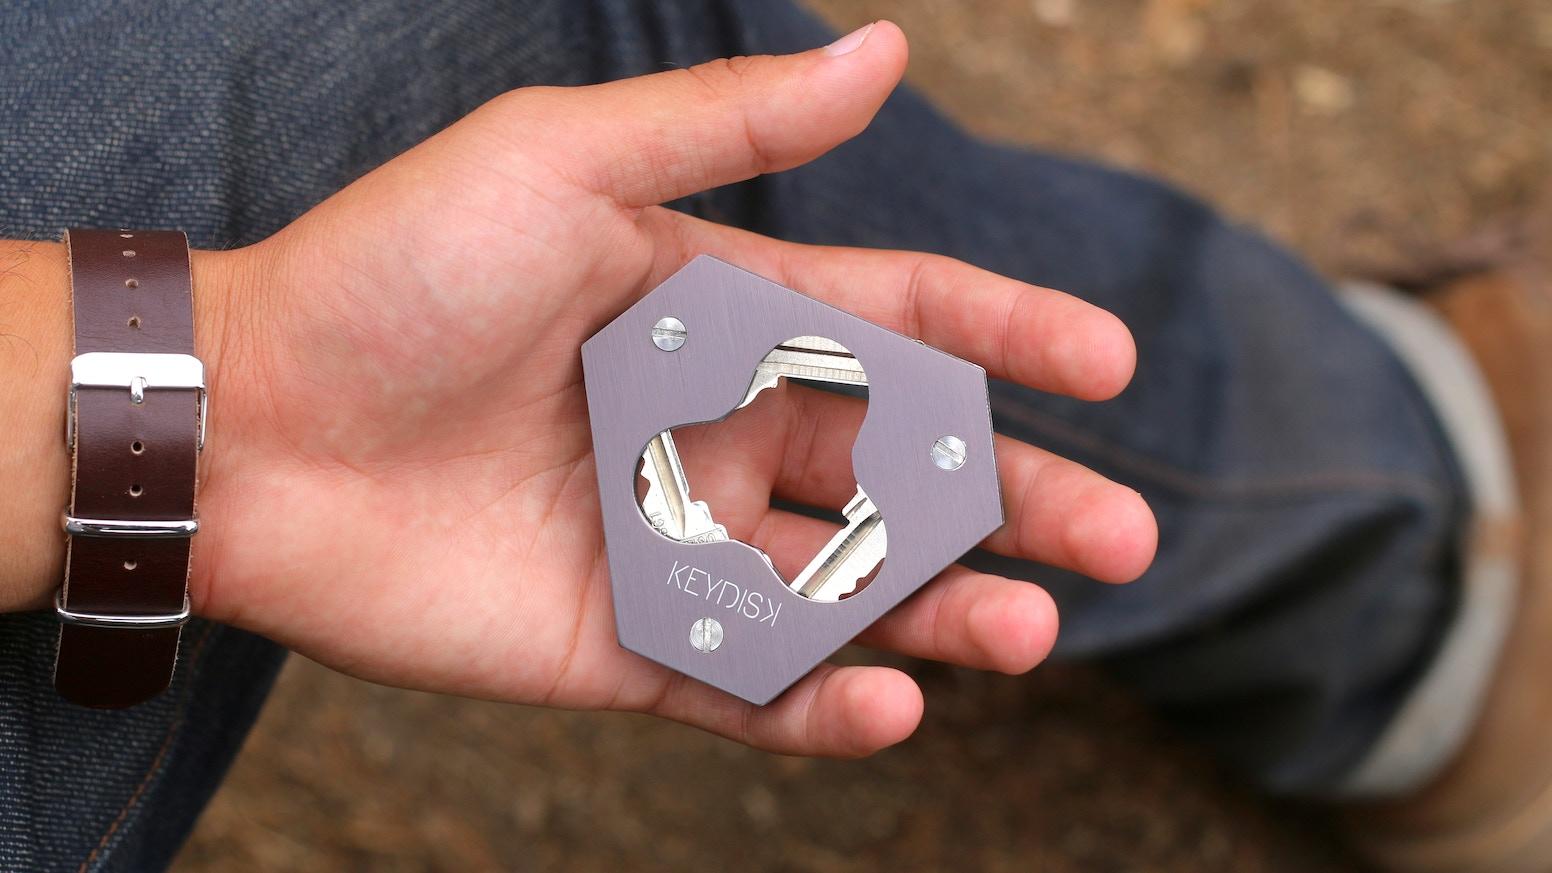 A New Way To Carry Keys Keydisk 2 By Co Switch Fitting Sleek Lightweight Build Unintrusive All Pocket Key Holder